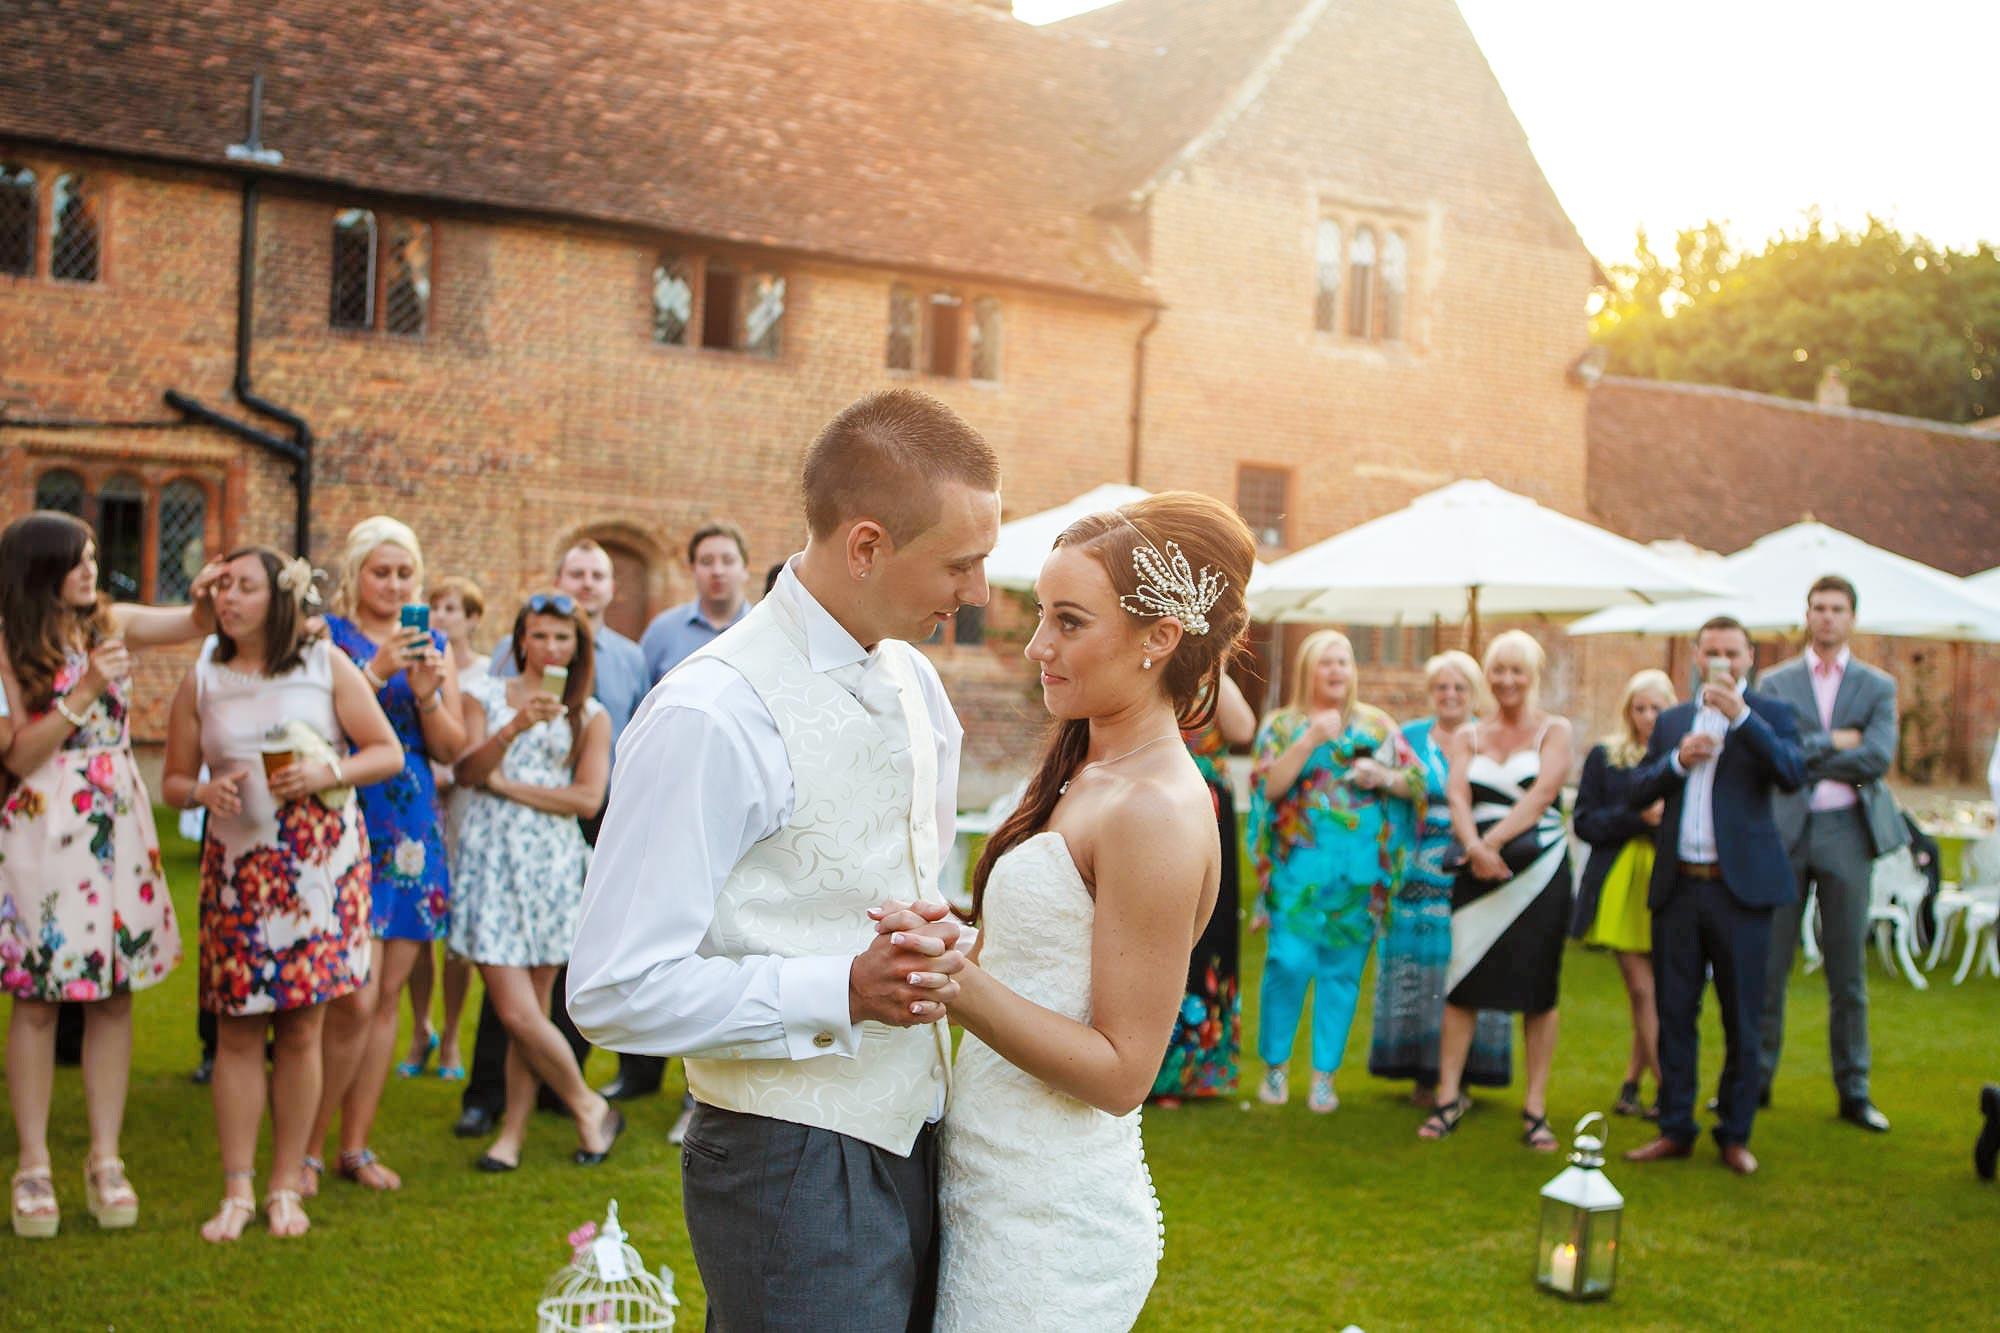 Leez Priory Wedding dancing